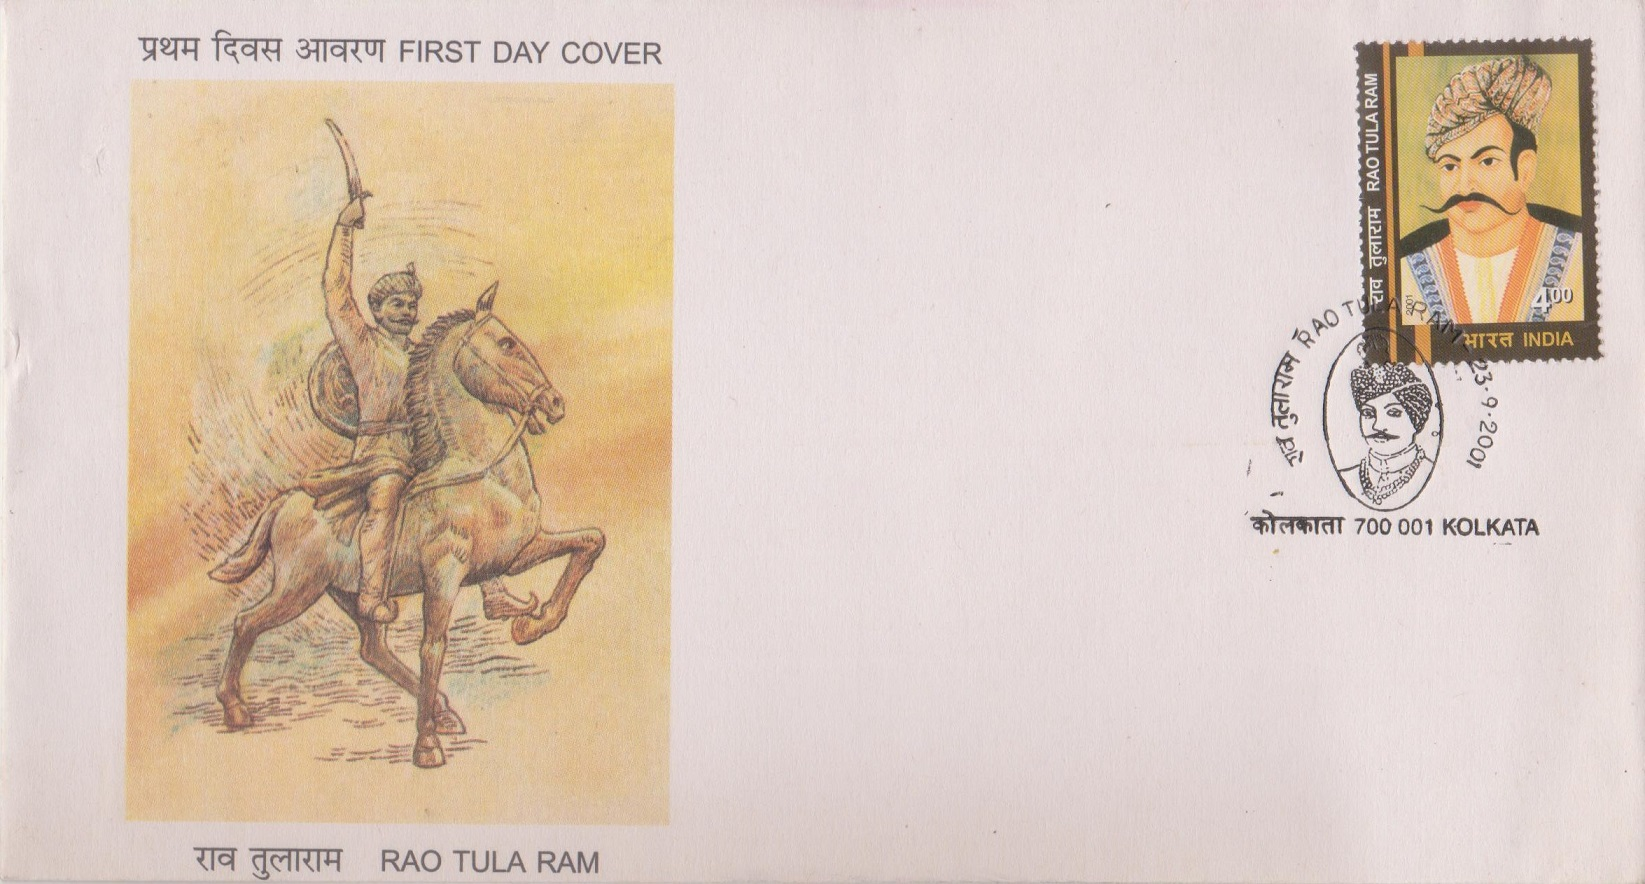 King of Rewari : State Hero of Haryana